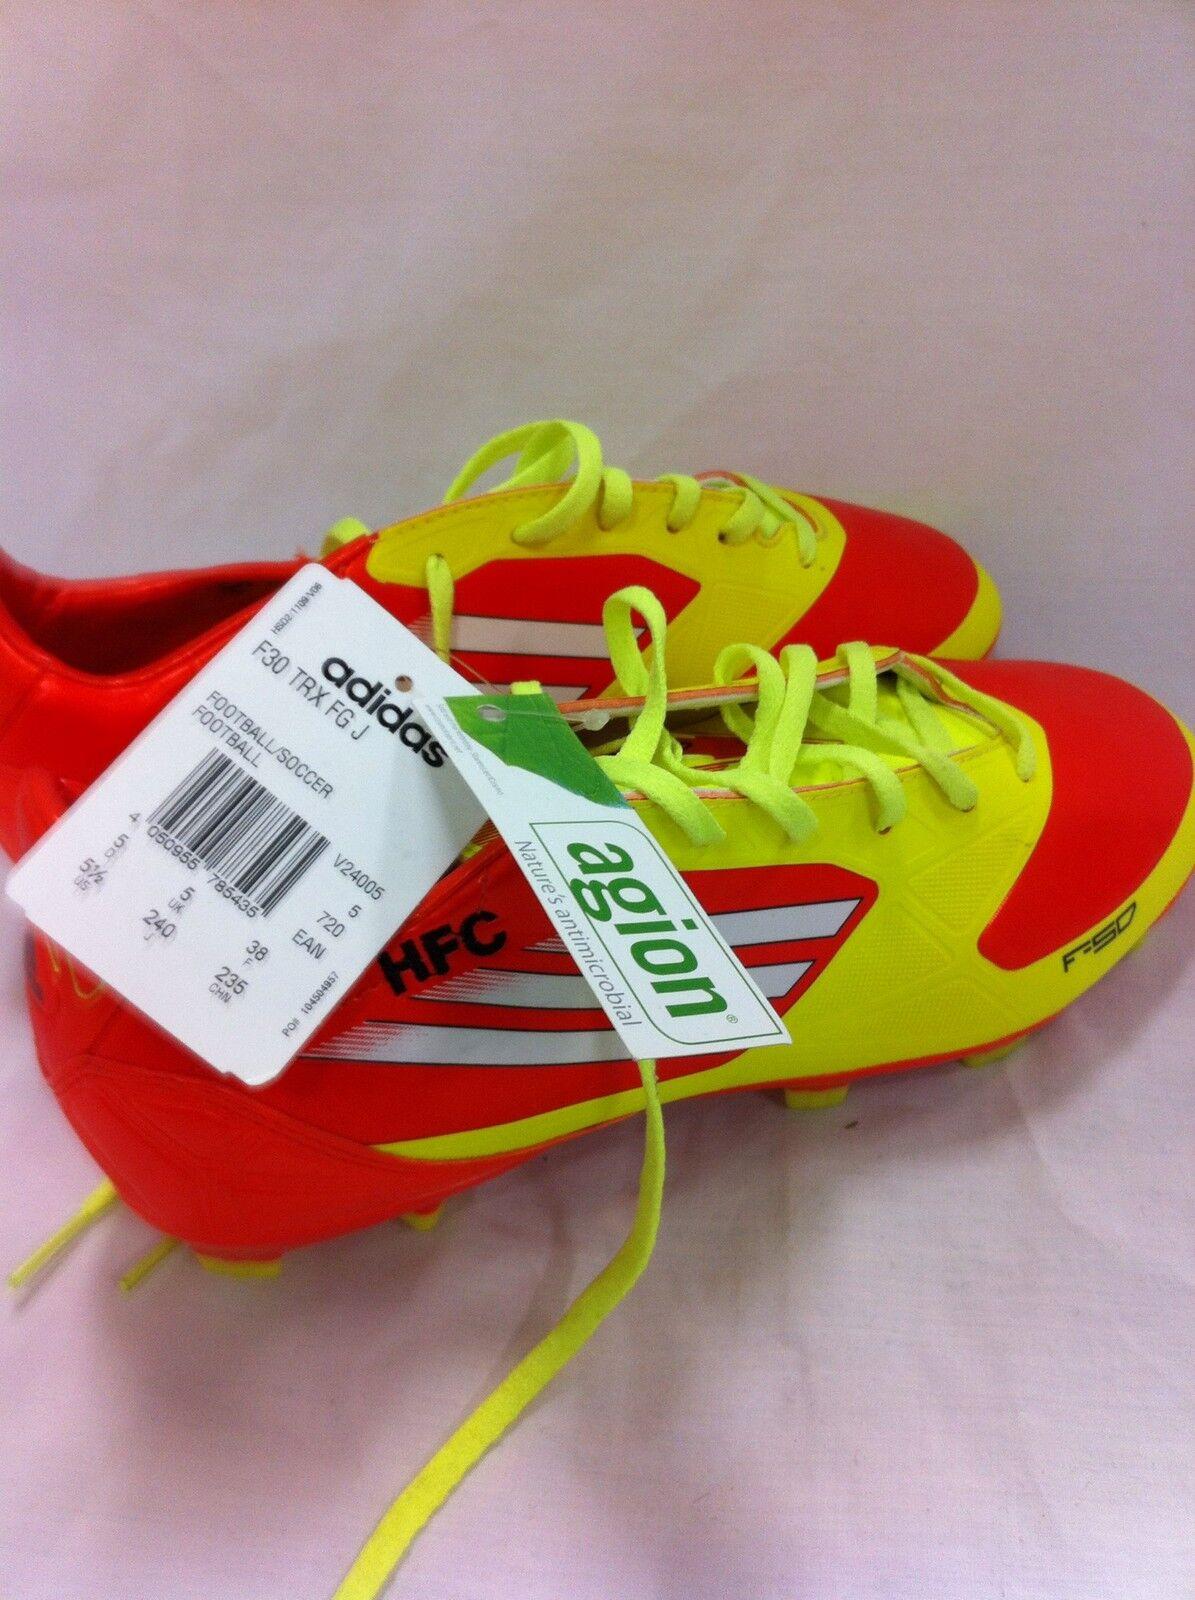 Addidas F50 Soccer Football stivali Leather Professional New